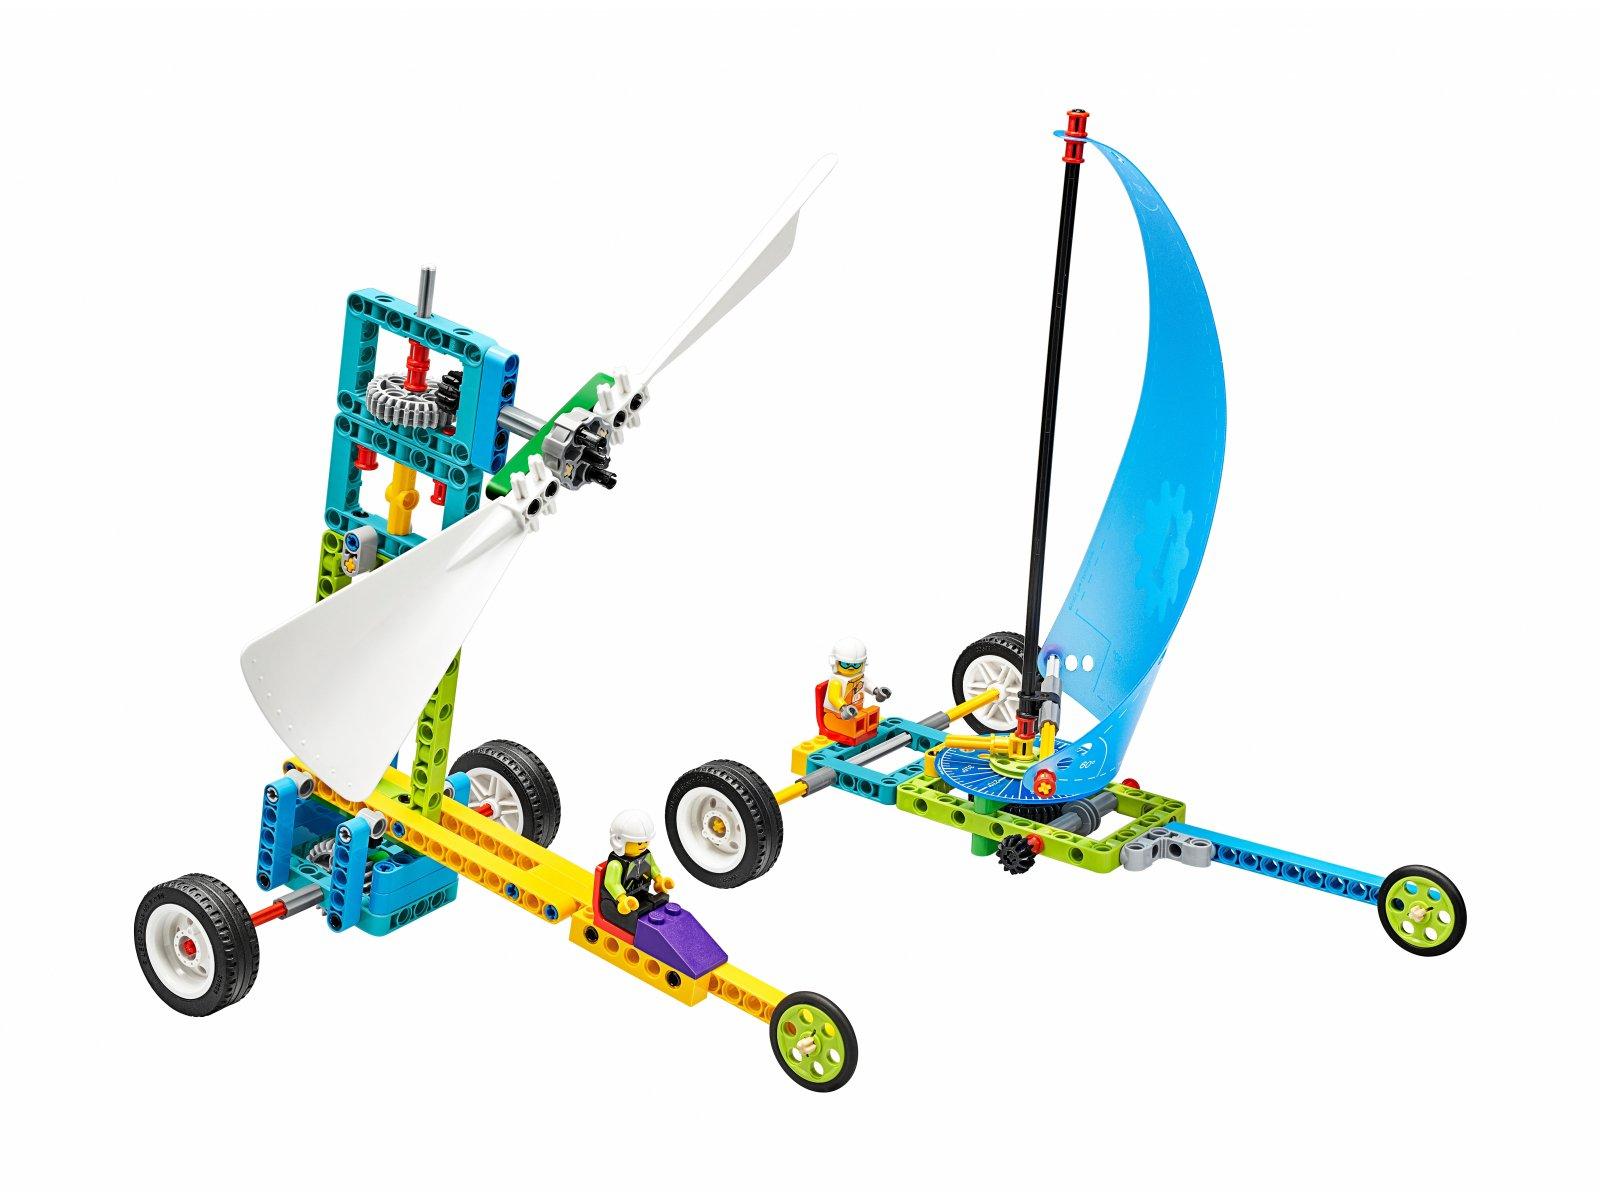 LEGO 45400 BricQ Motion Prime